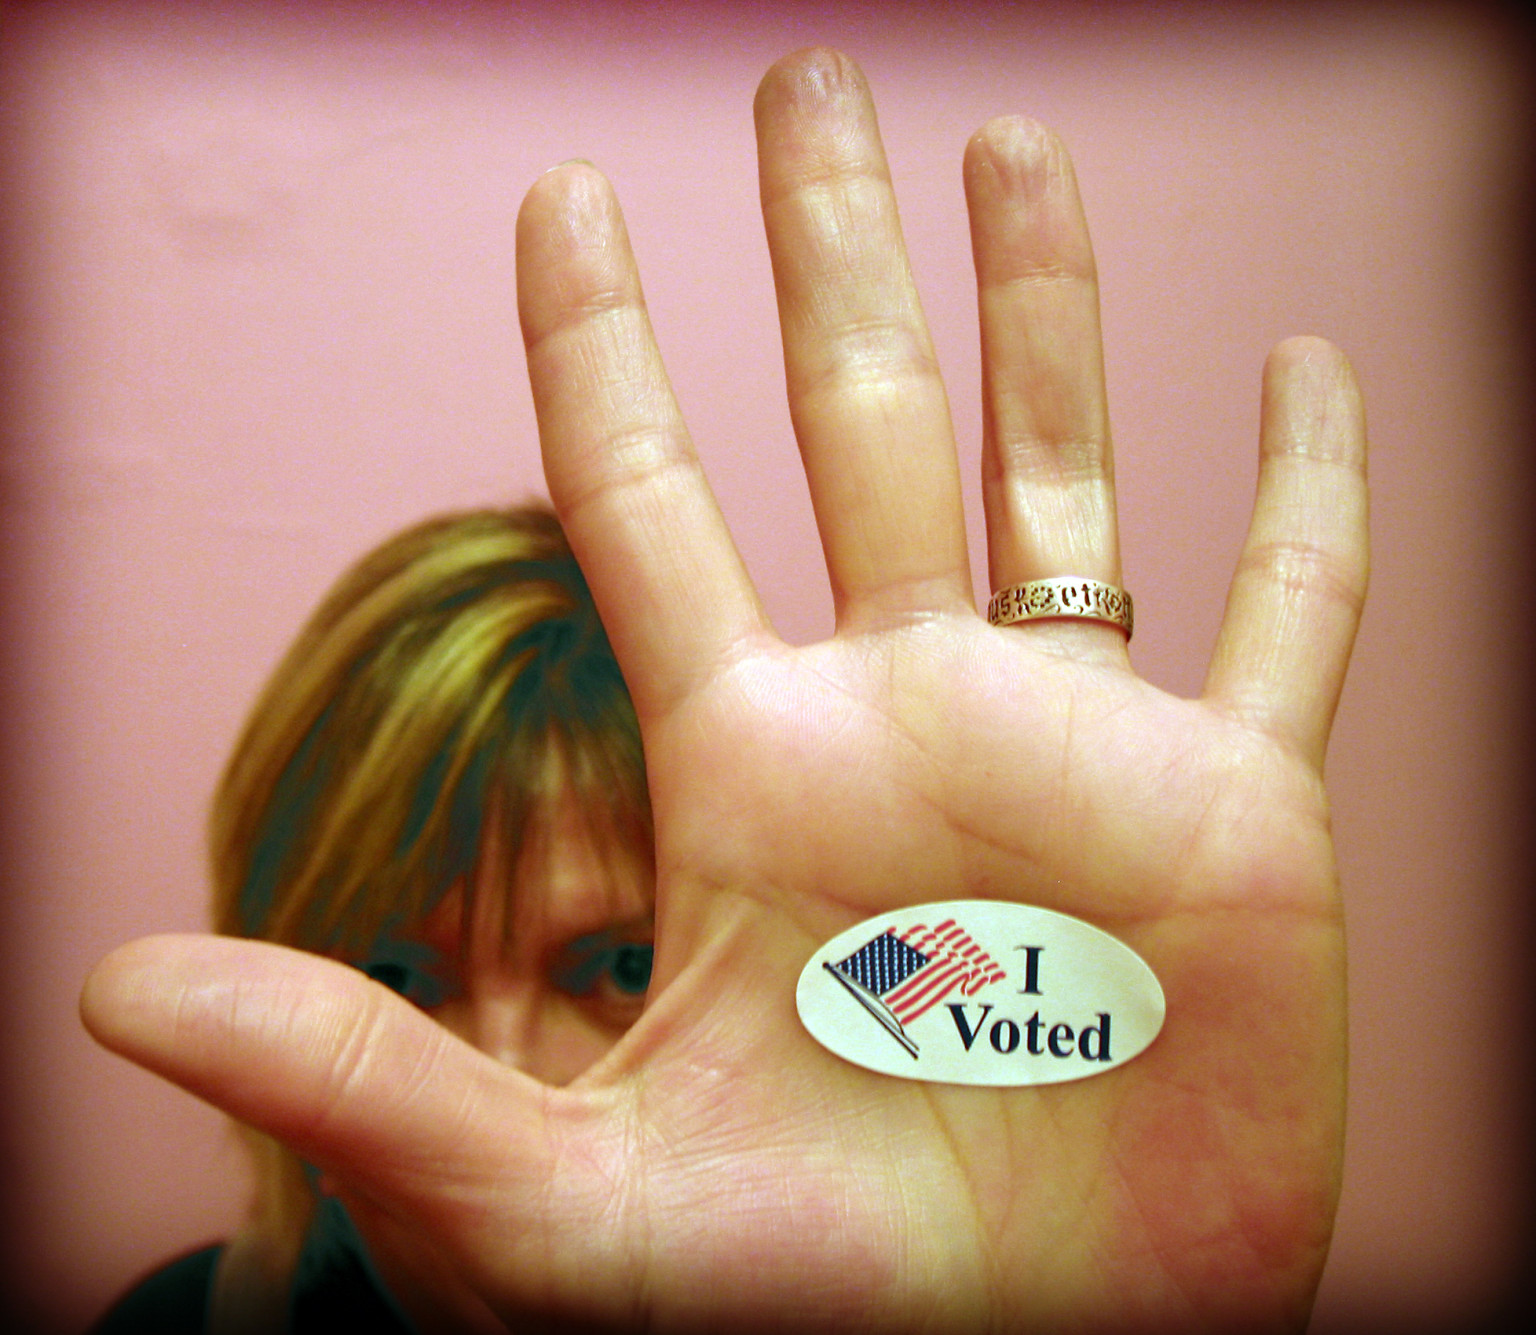 Image result for I voted sticker hand